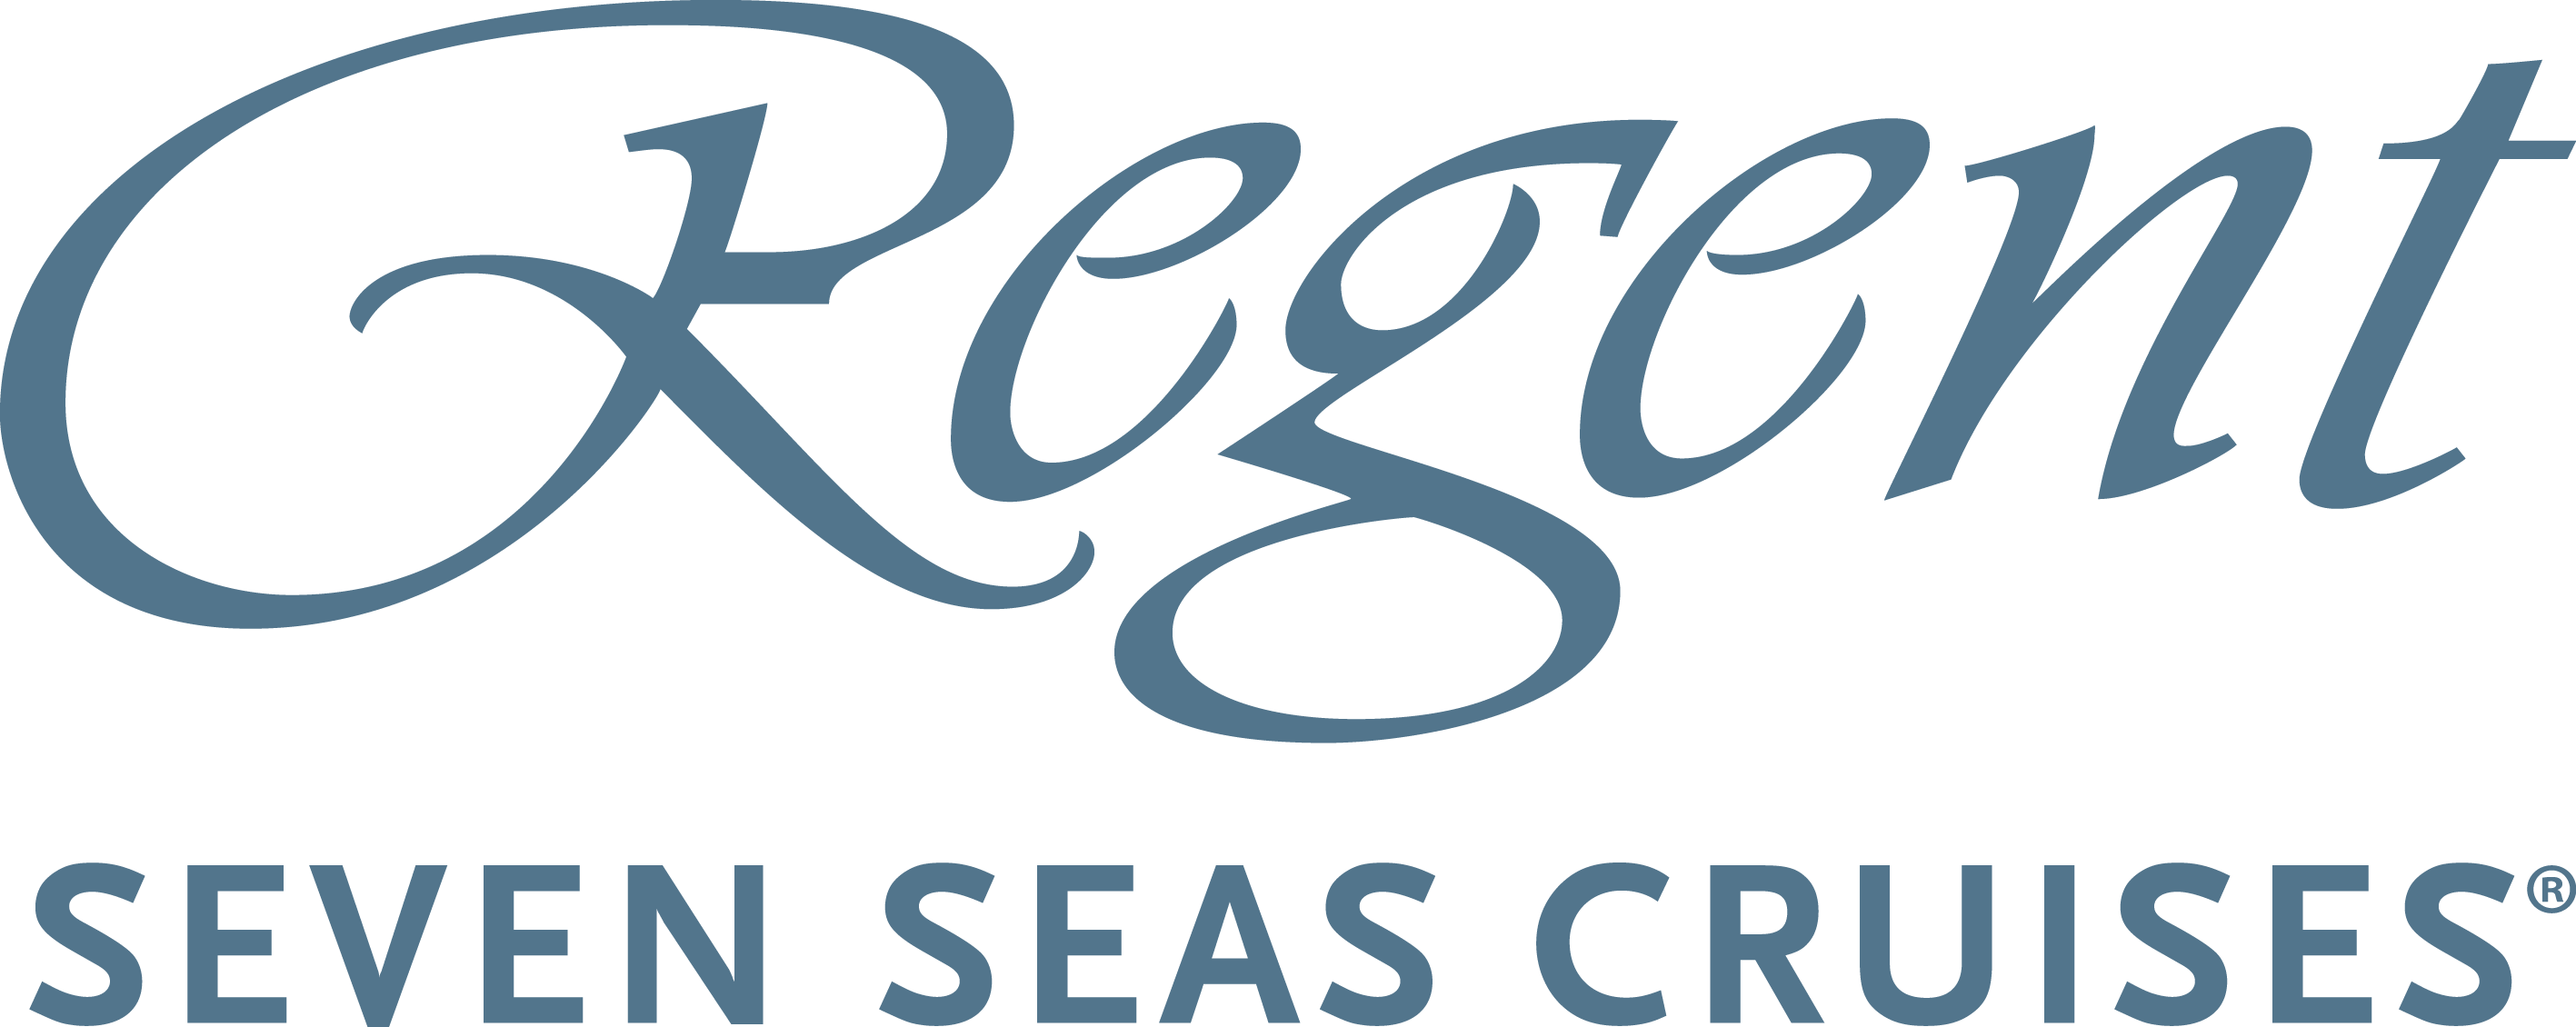 RSSC Logo (Regent Seven Seas Cruises) png